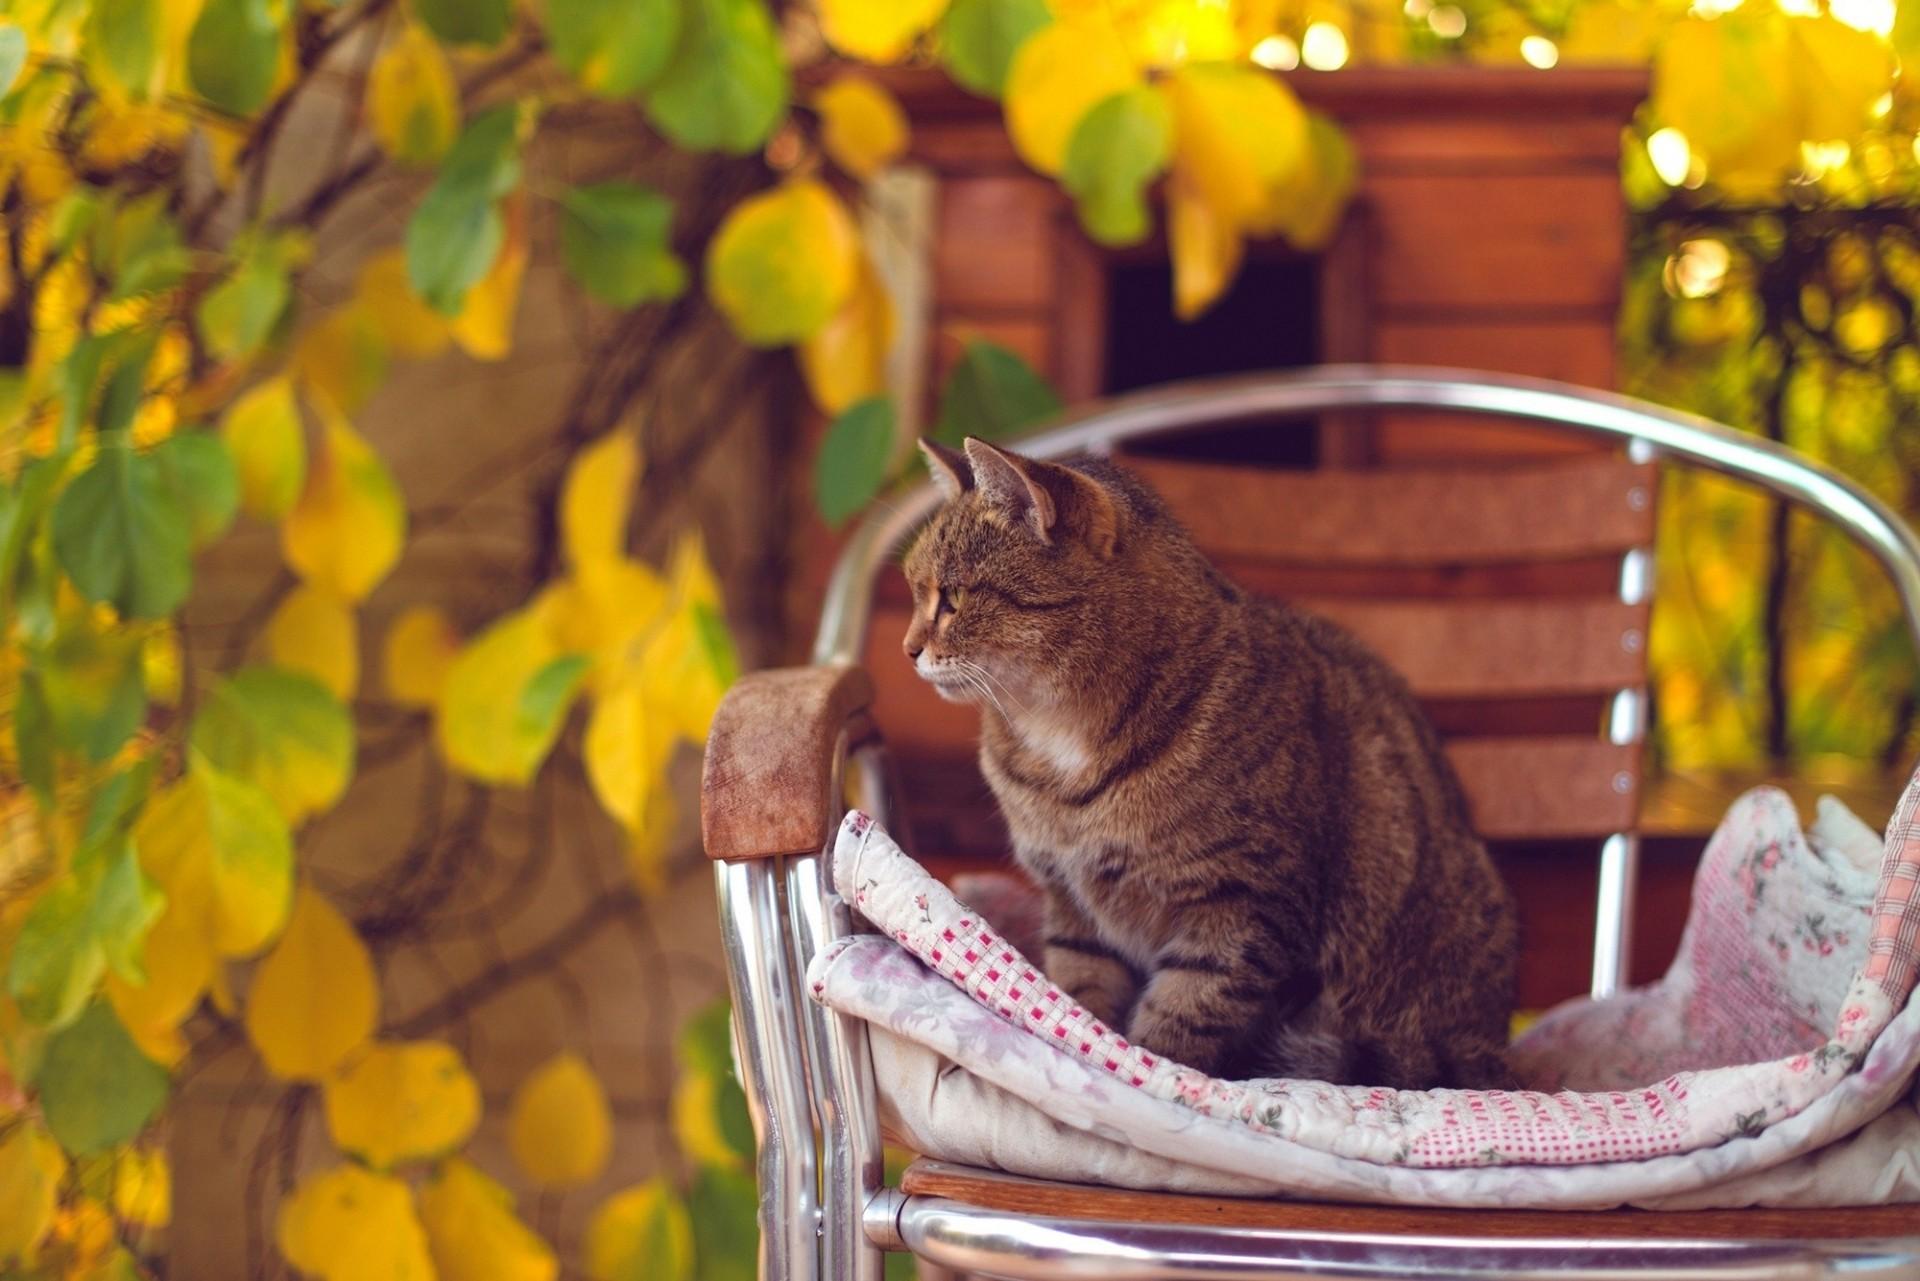 кот животное кресло морда  № 1943795 бесплатно